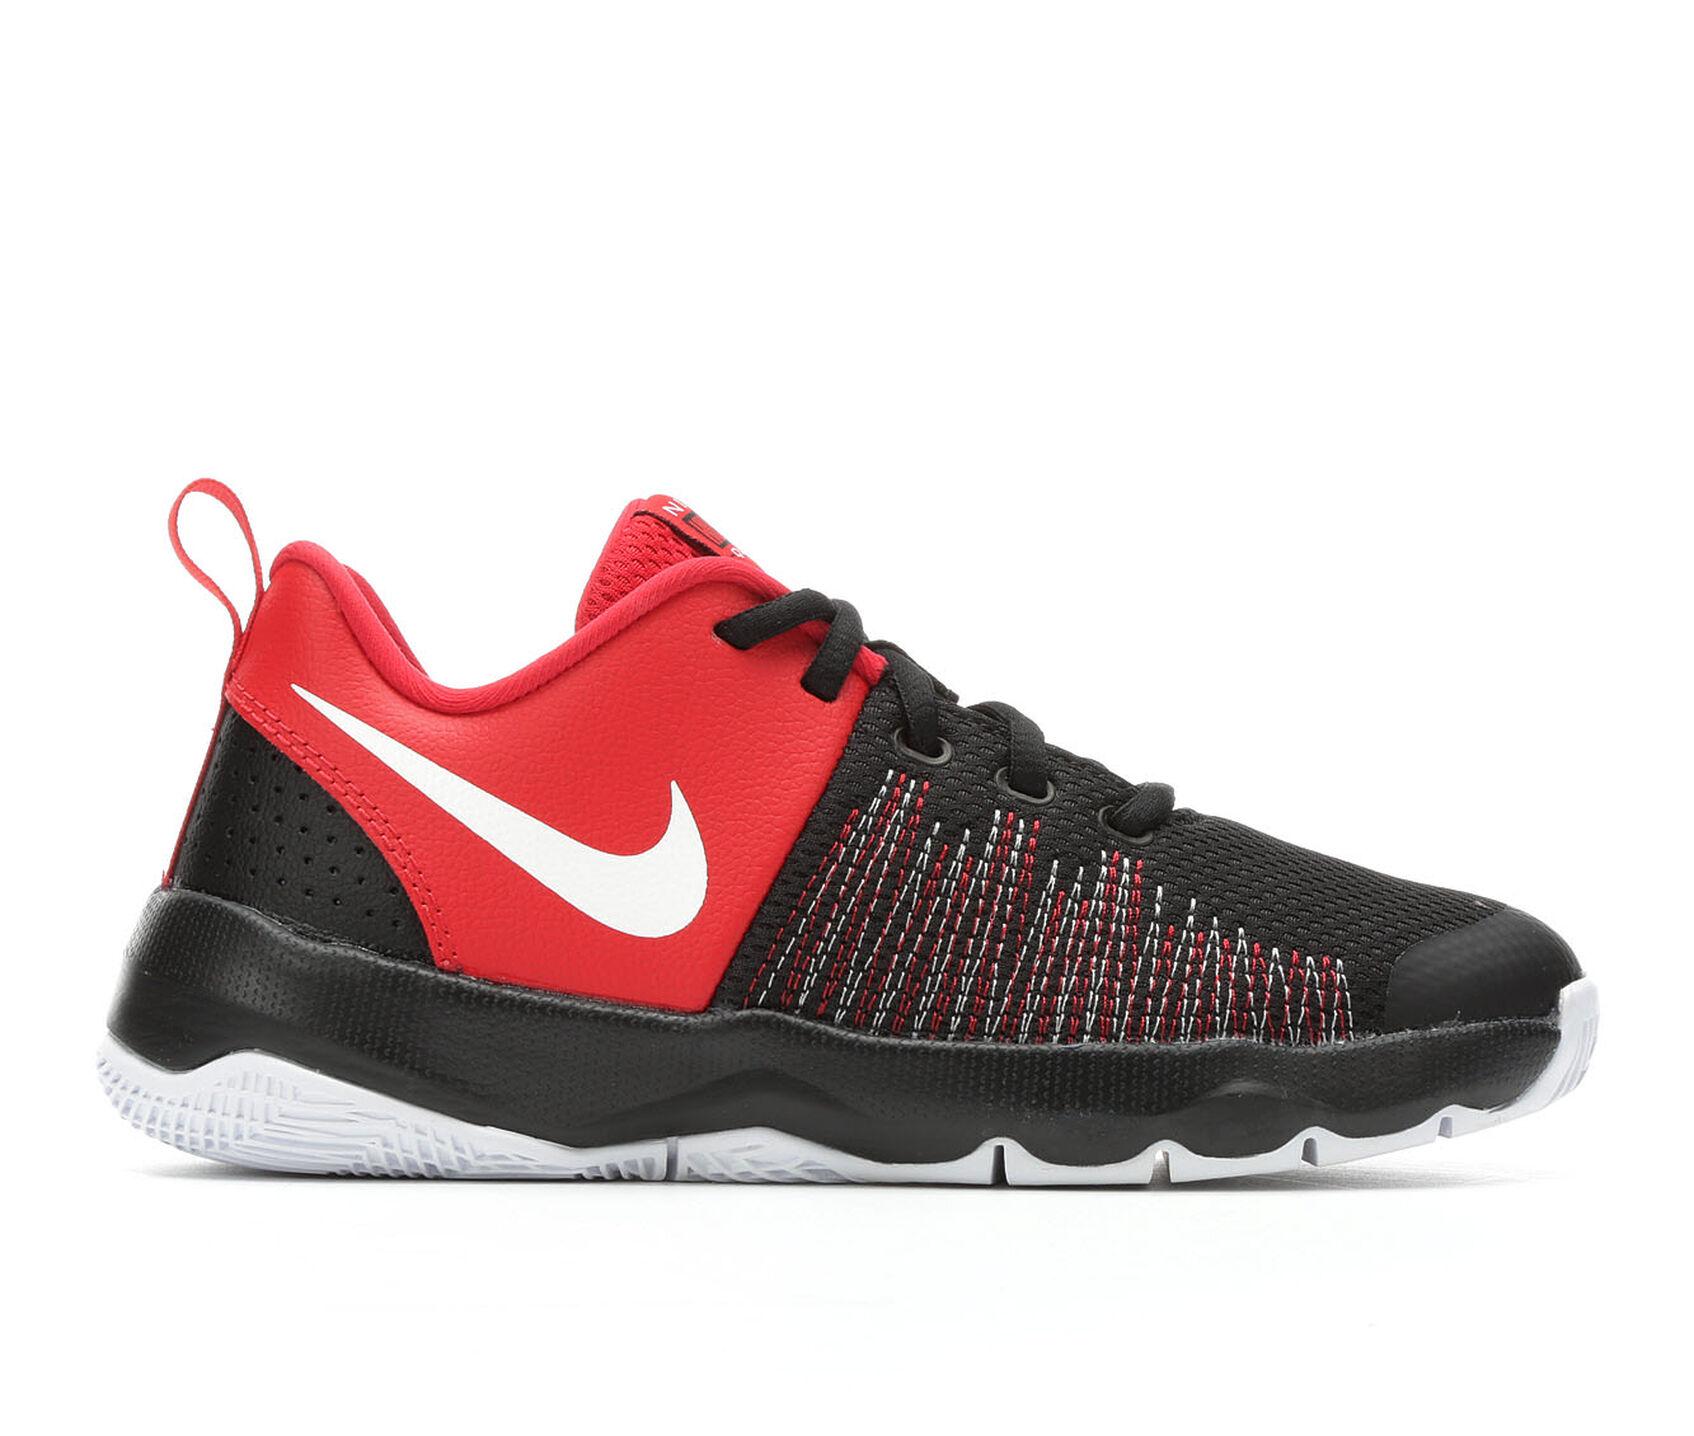 4c9d84e229e2 ... Nike Big Kid Team Hustle Quick Basketball Shoes. Previous